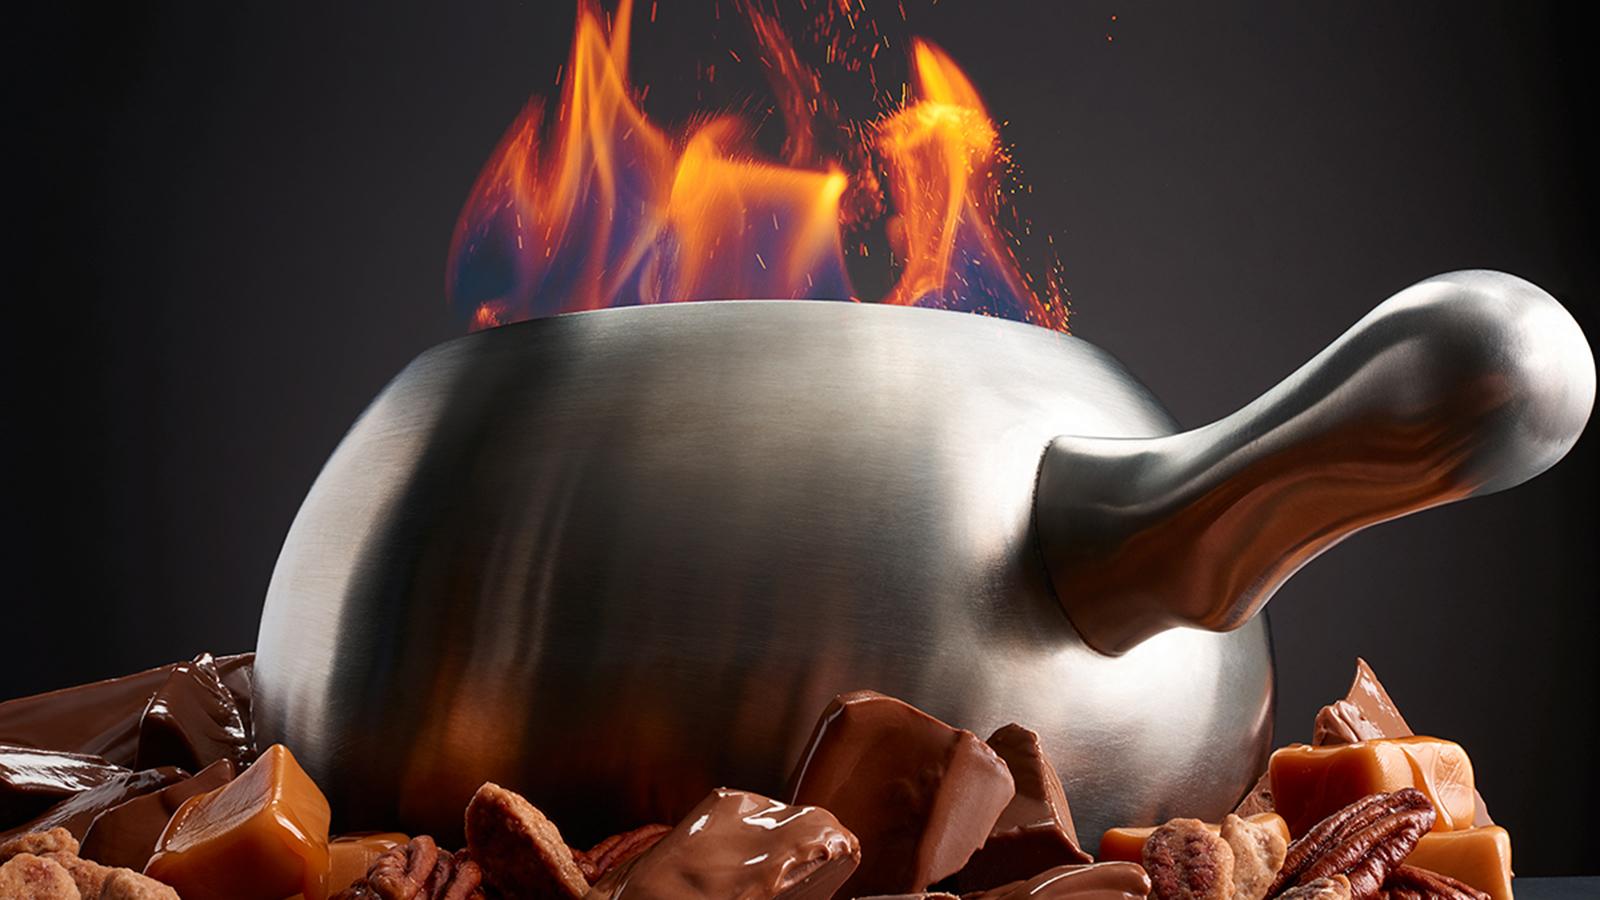 Flaming Pot of Chocolate Fondue